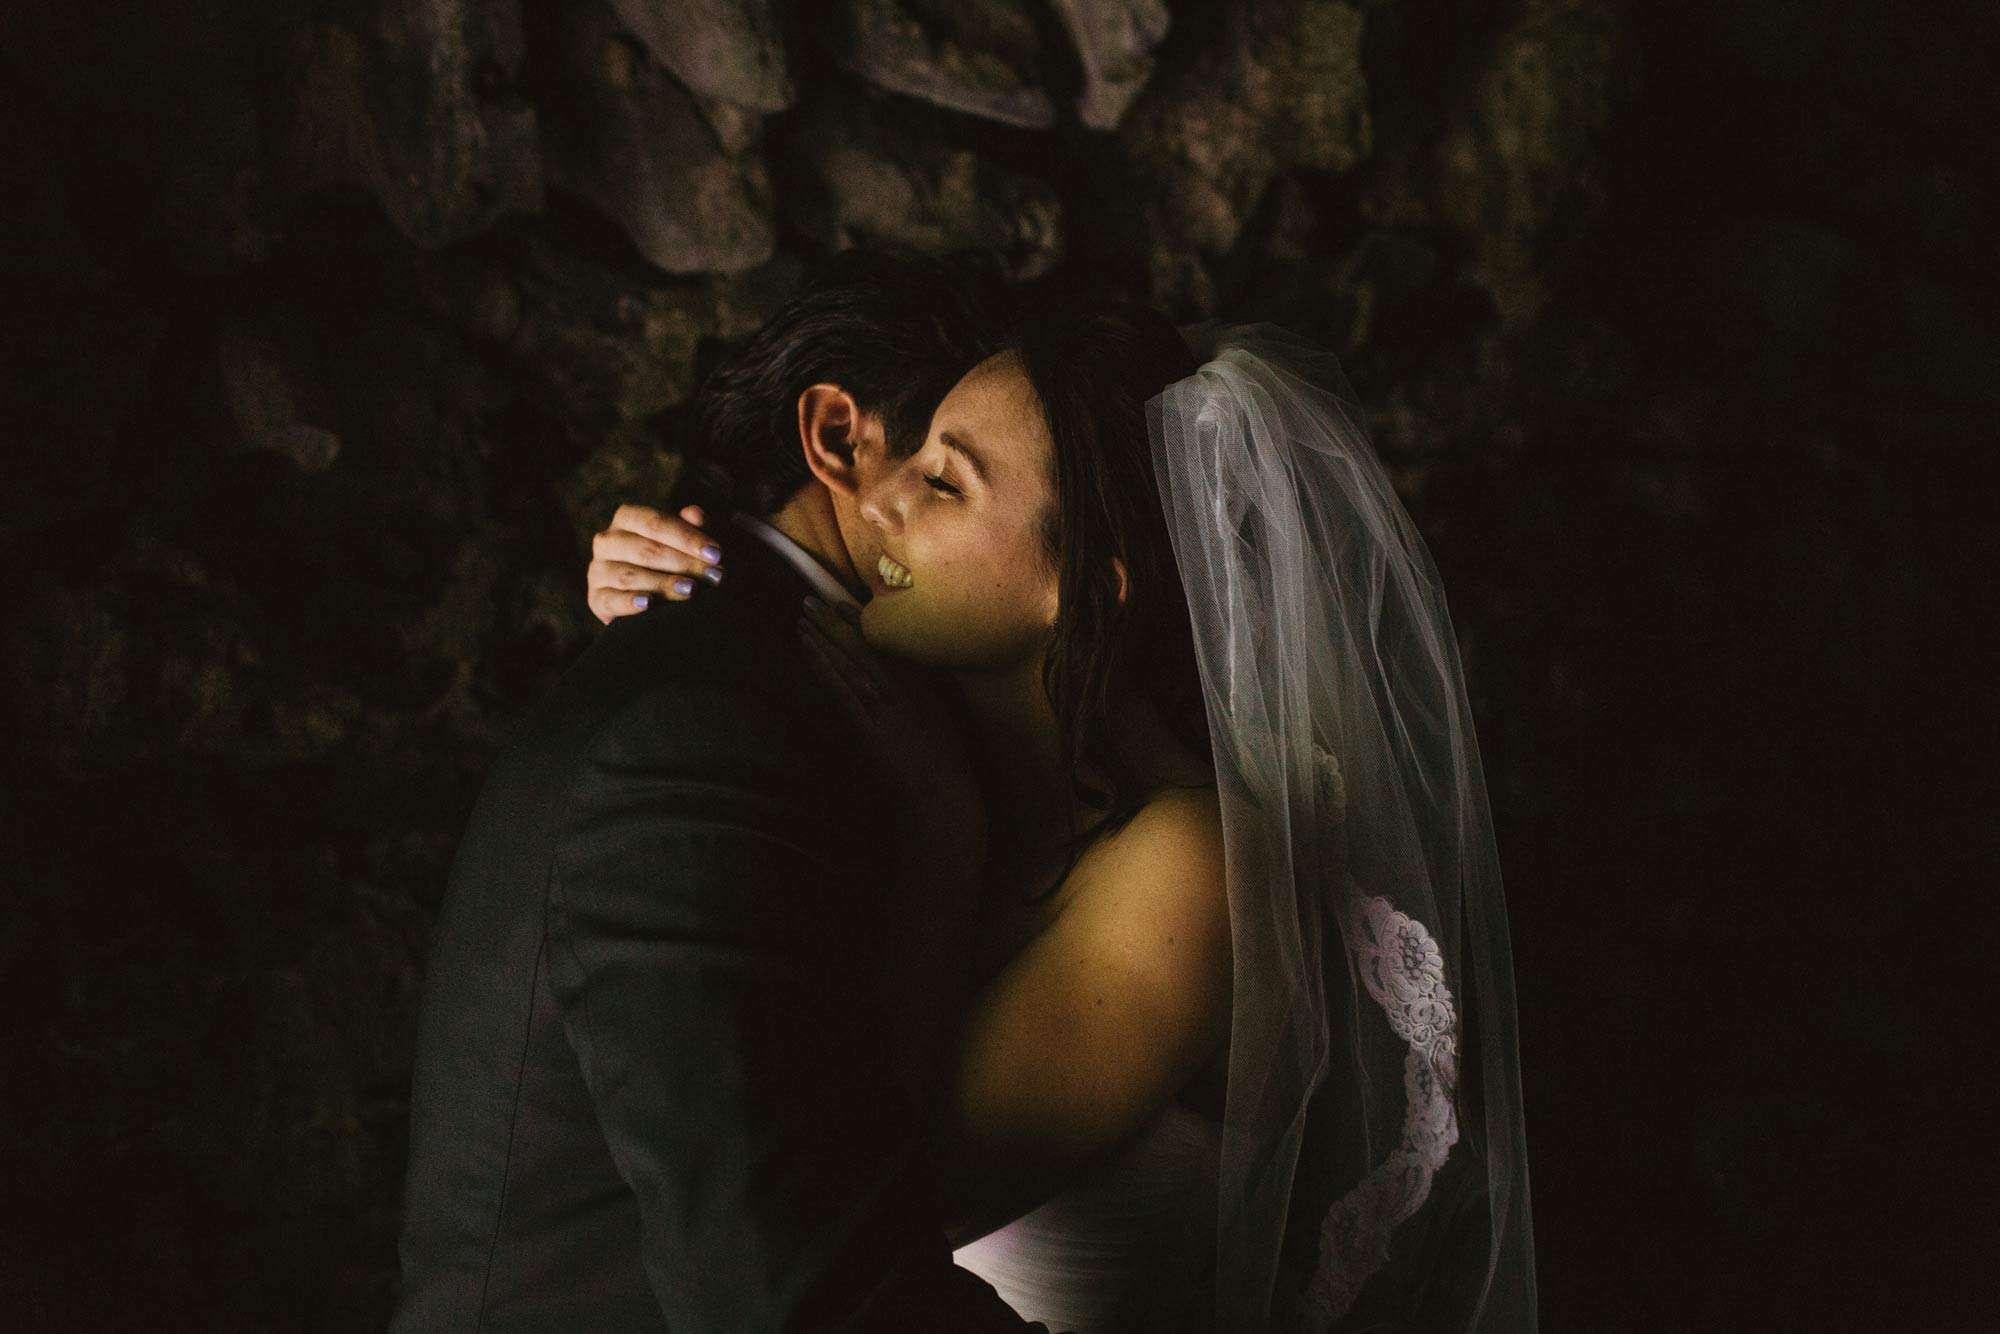 couple hug in low light